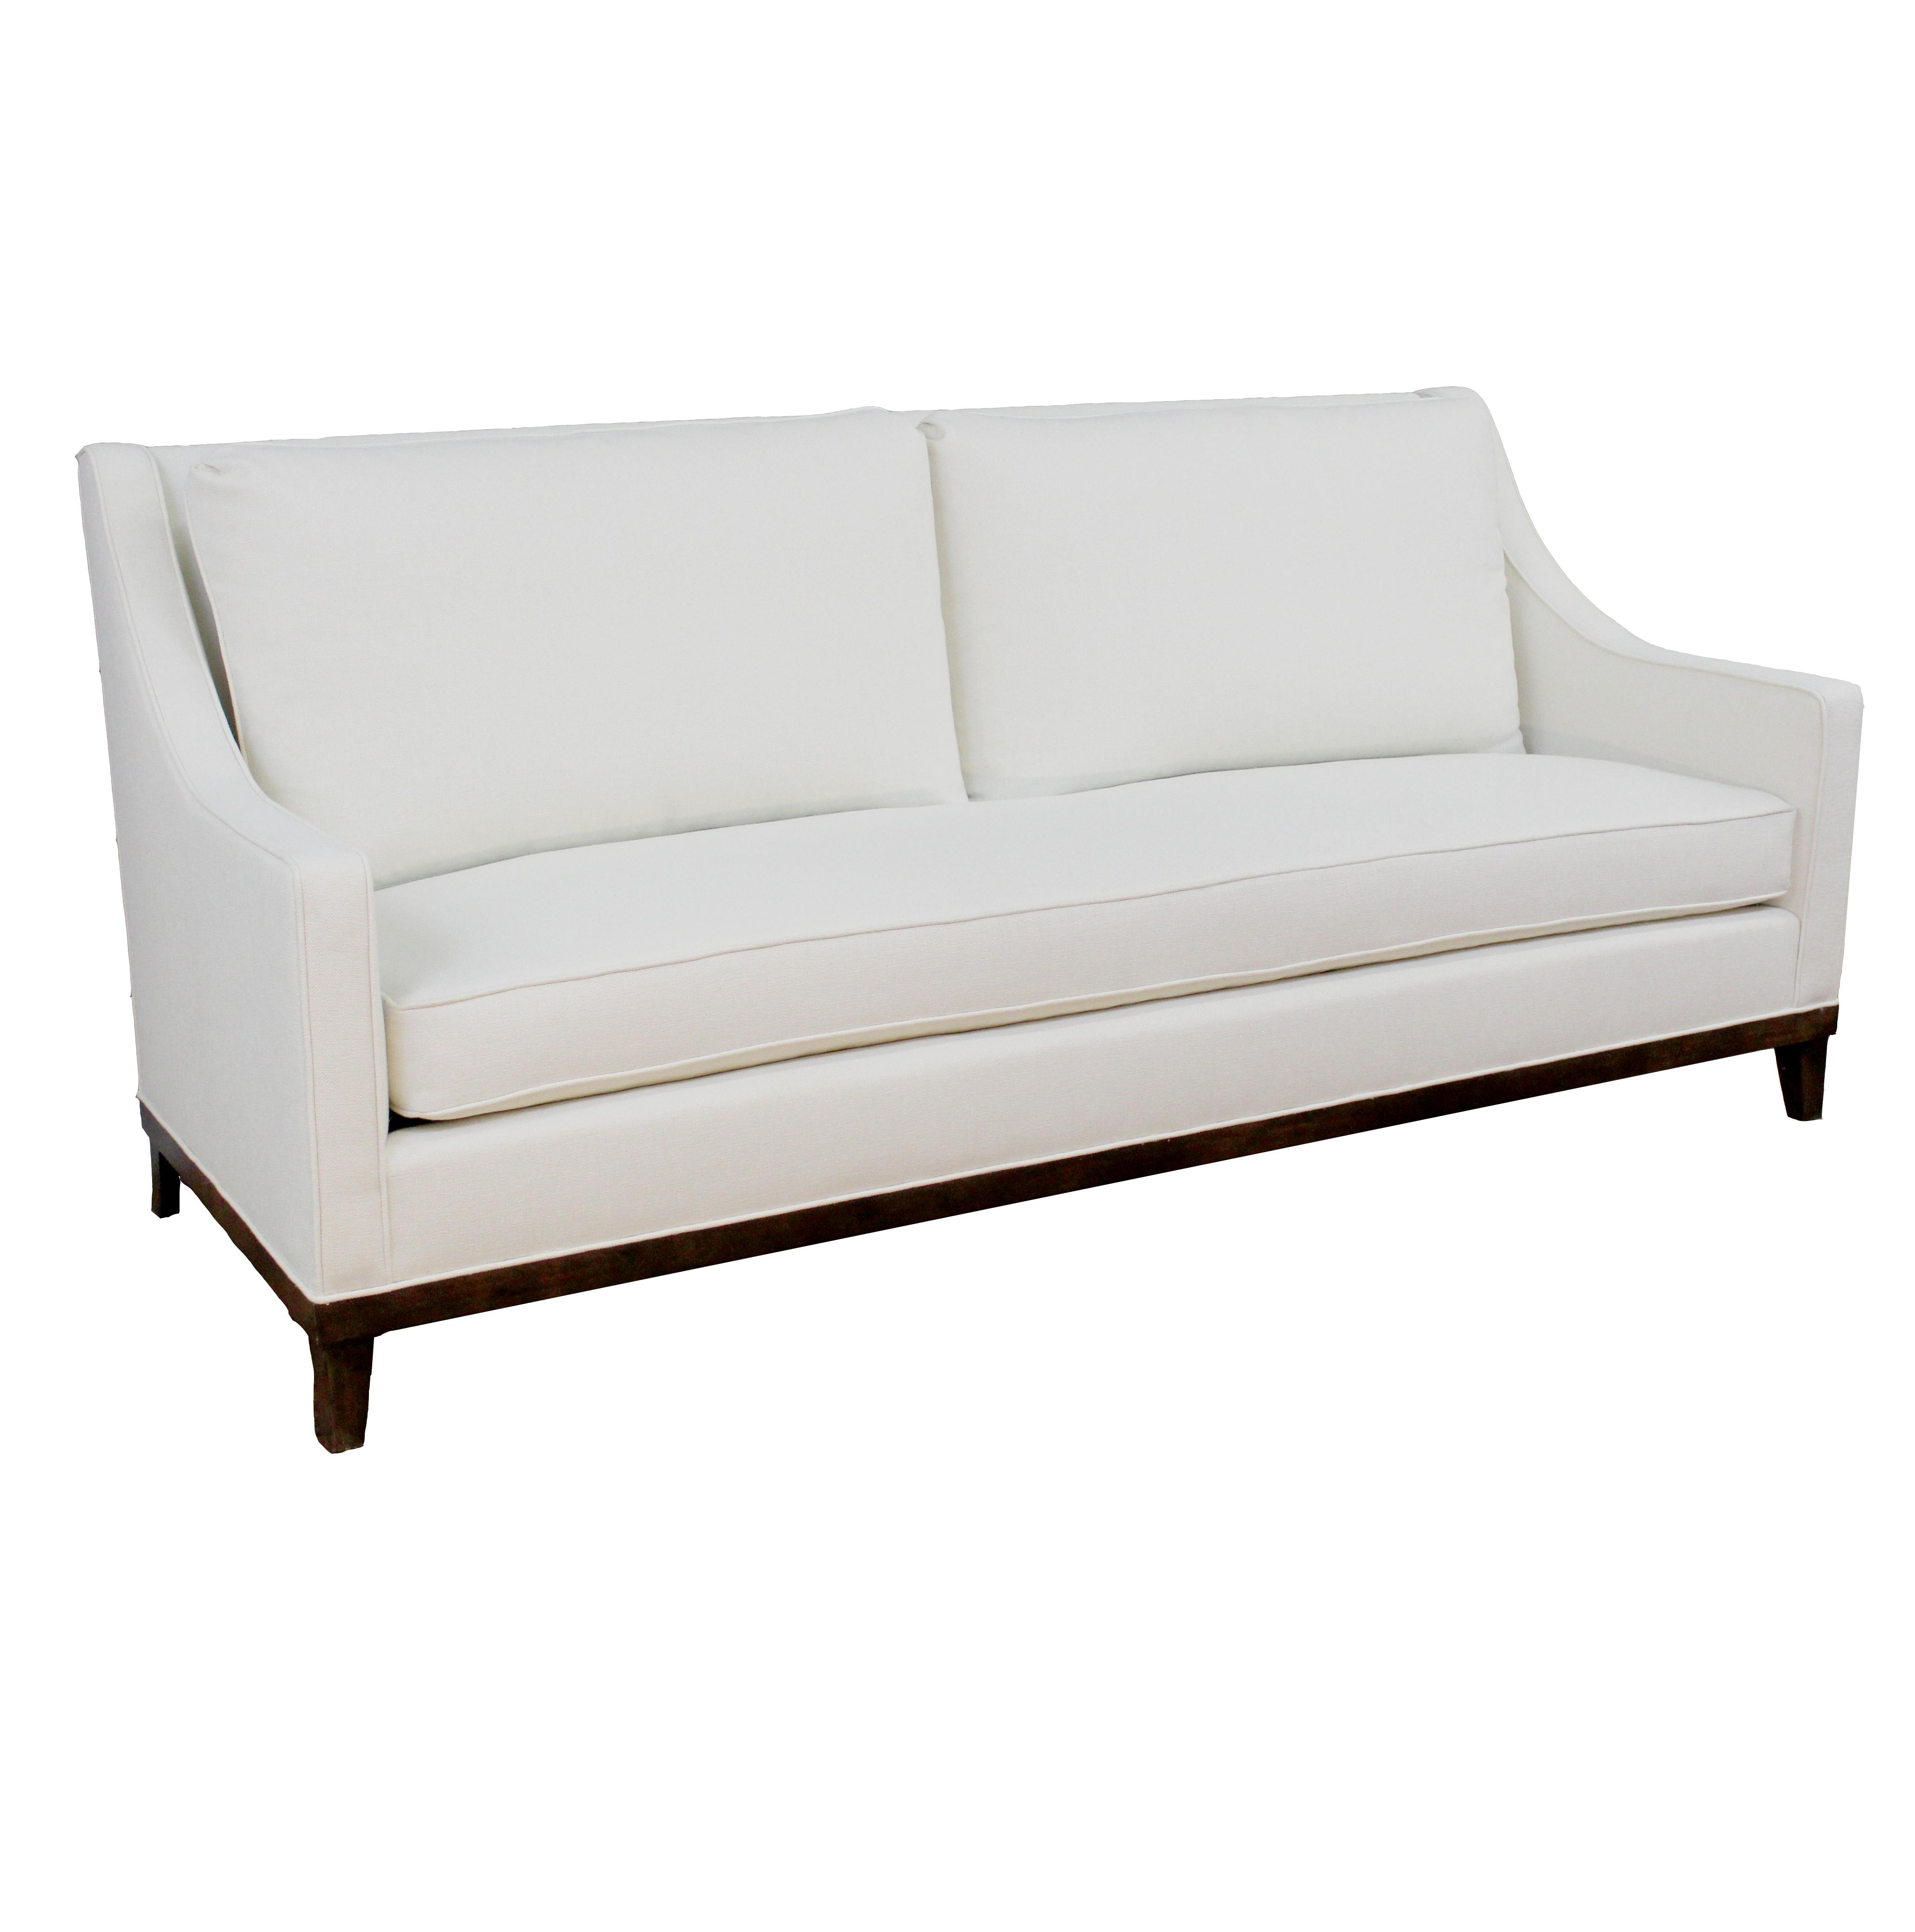 SF-211-LB – Lester Furniture Mfg